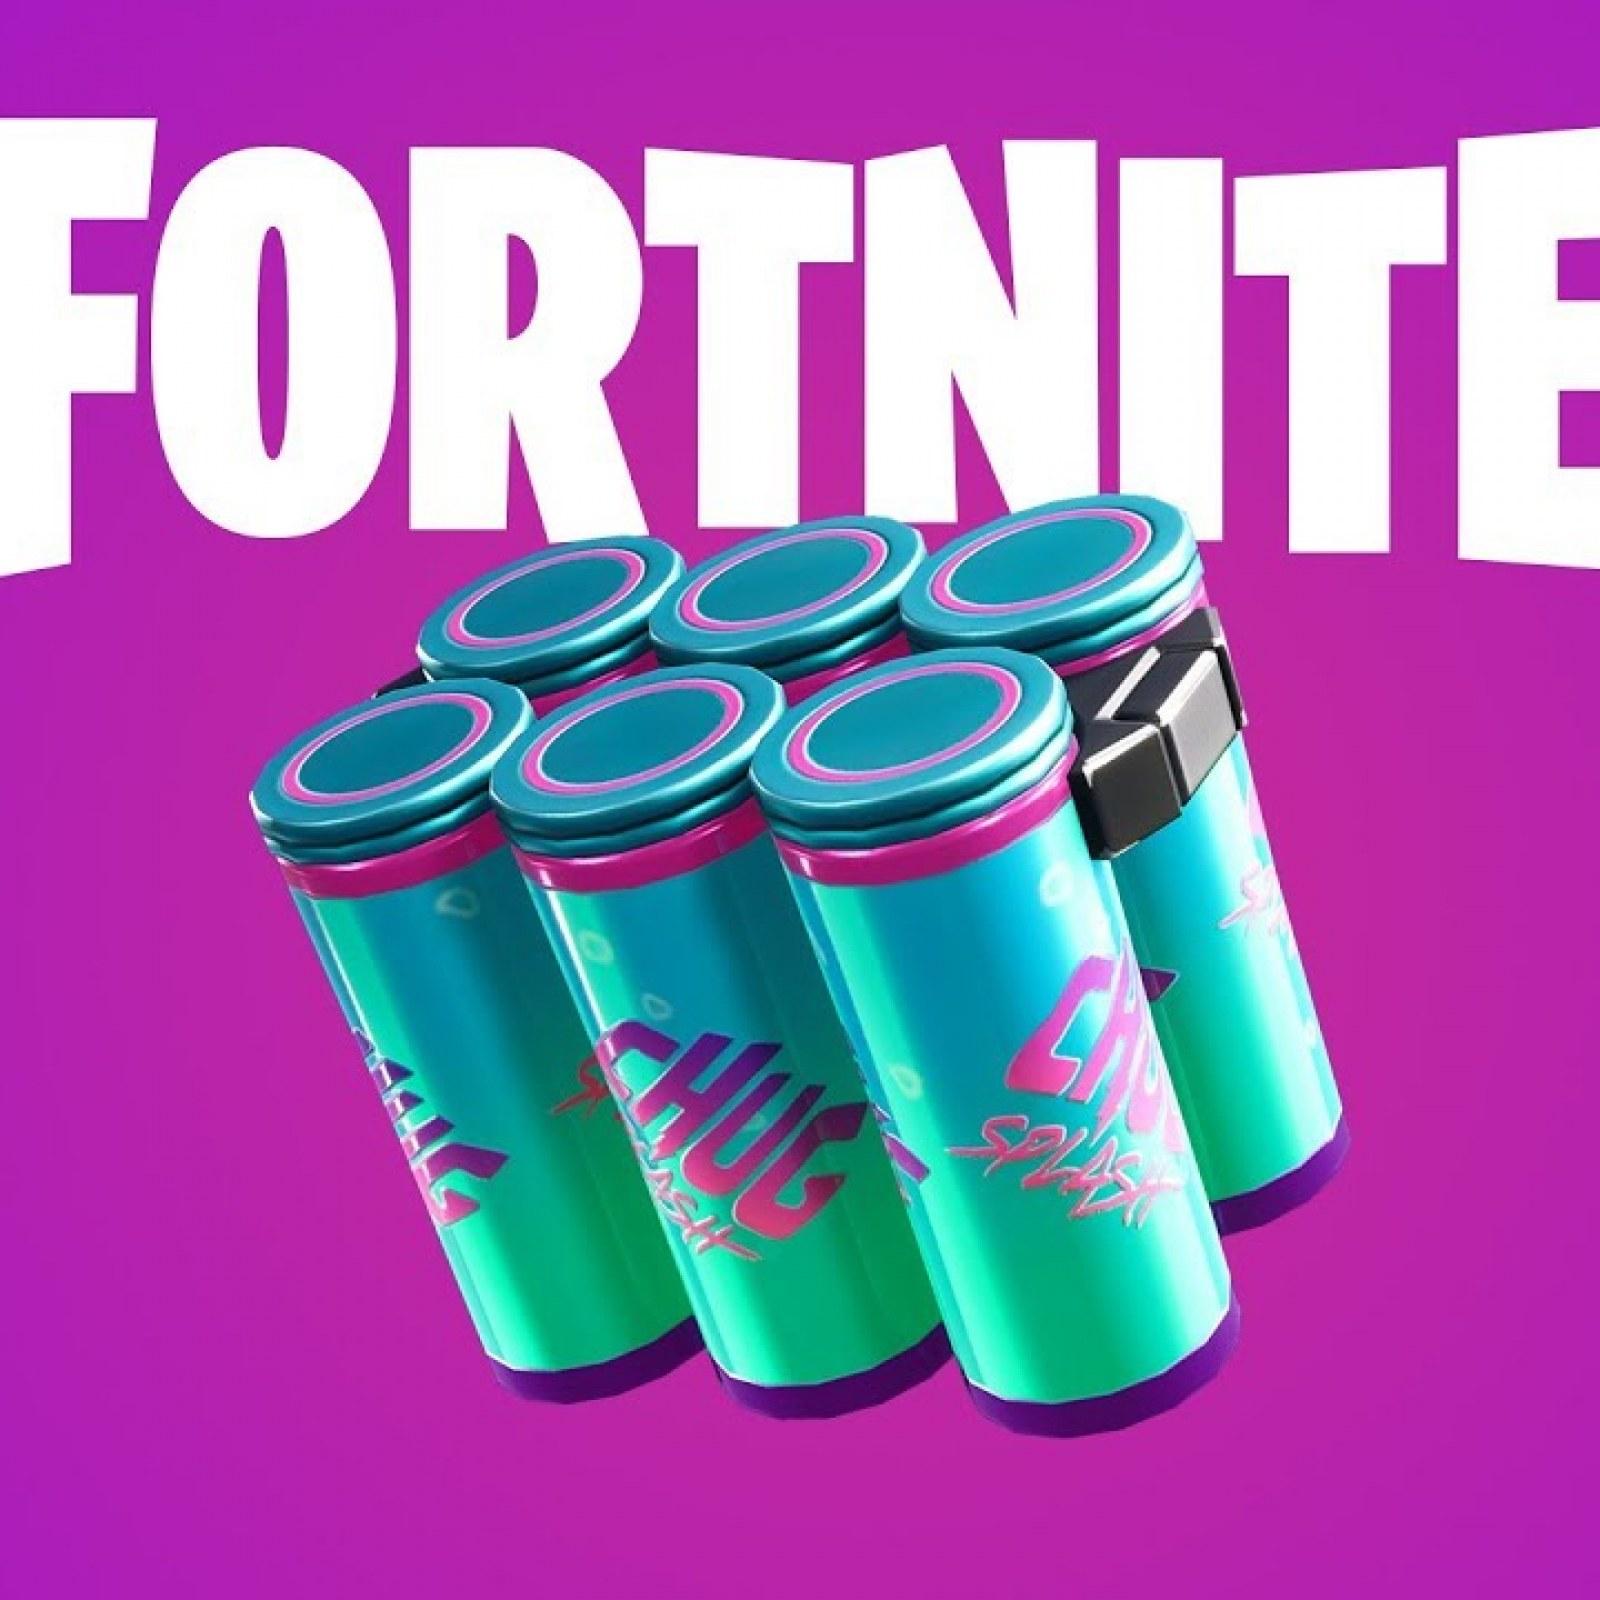 Fortnite' Update 9 30 Adds Chug Splash & Prop Hunt, Vaults